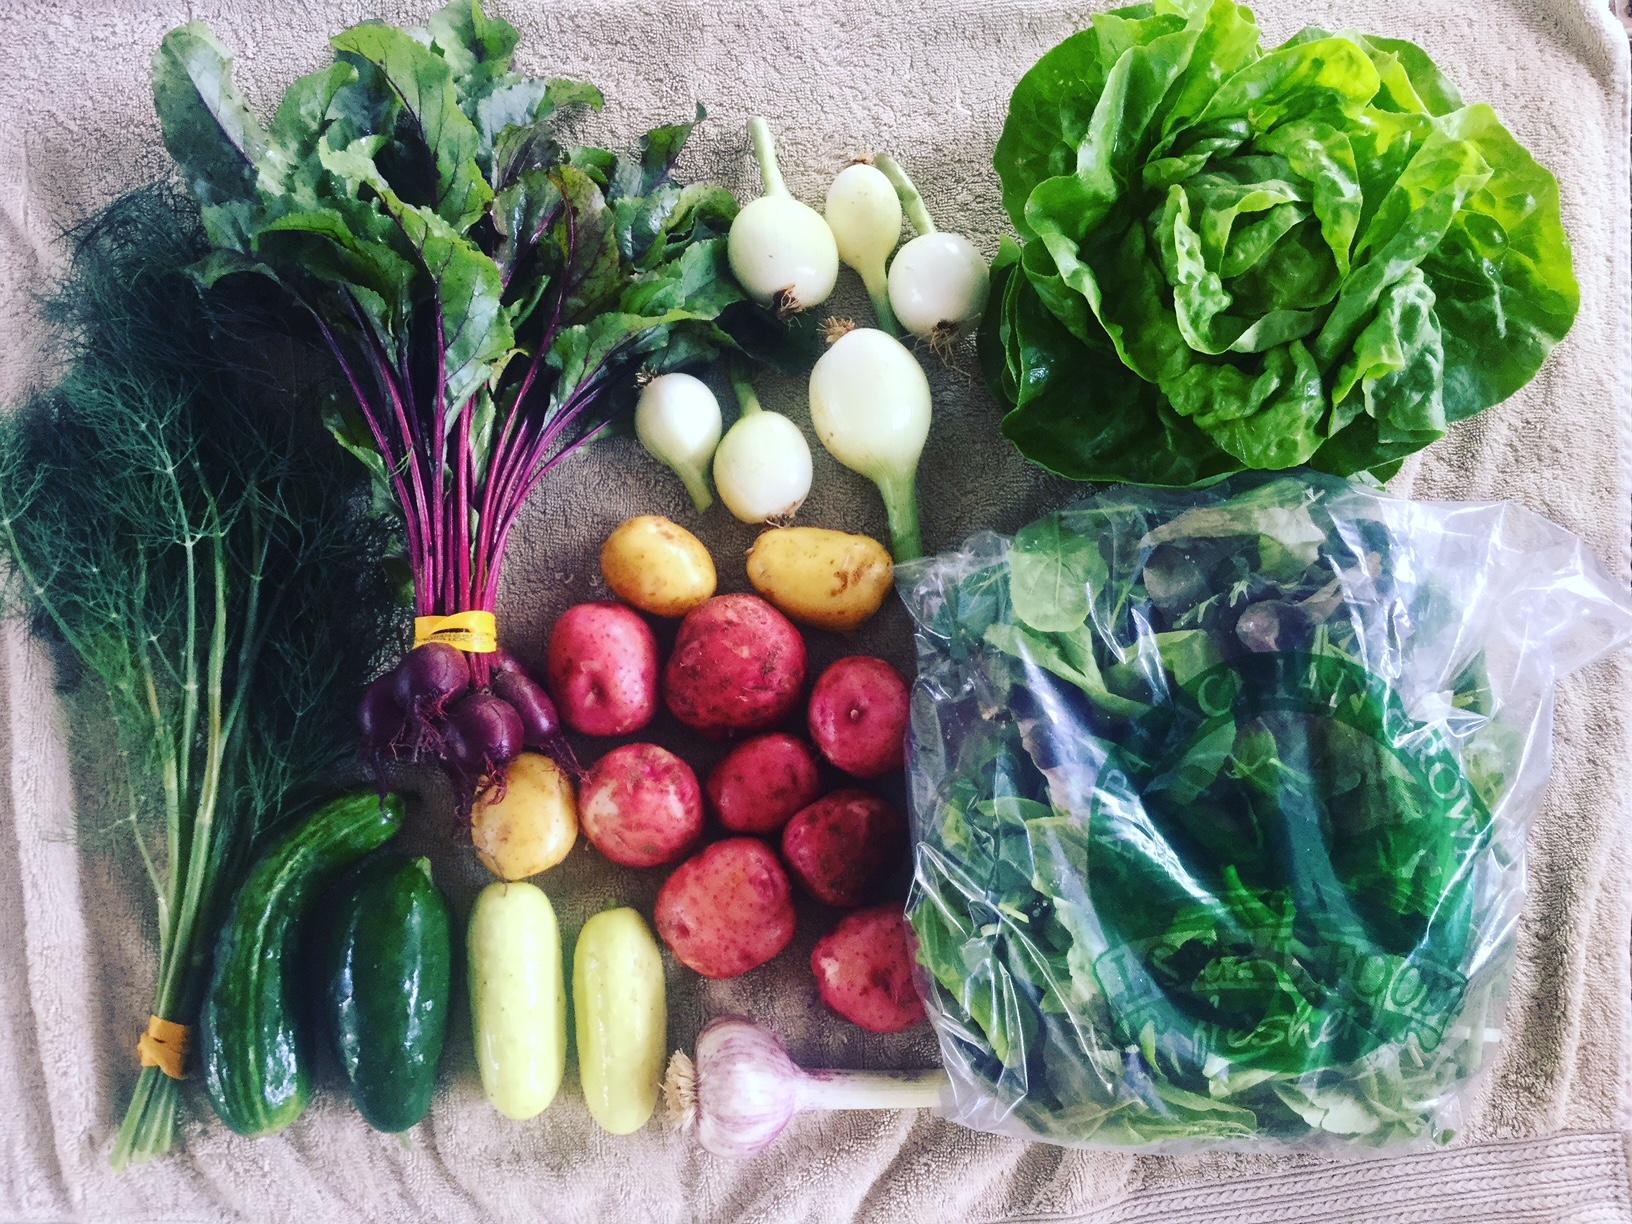 Large Veggie Share